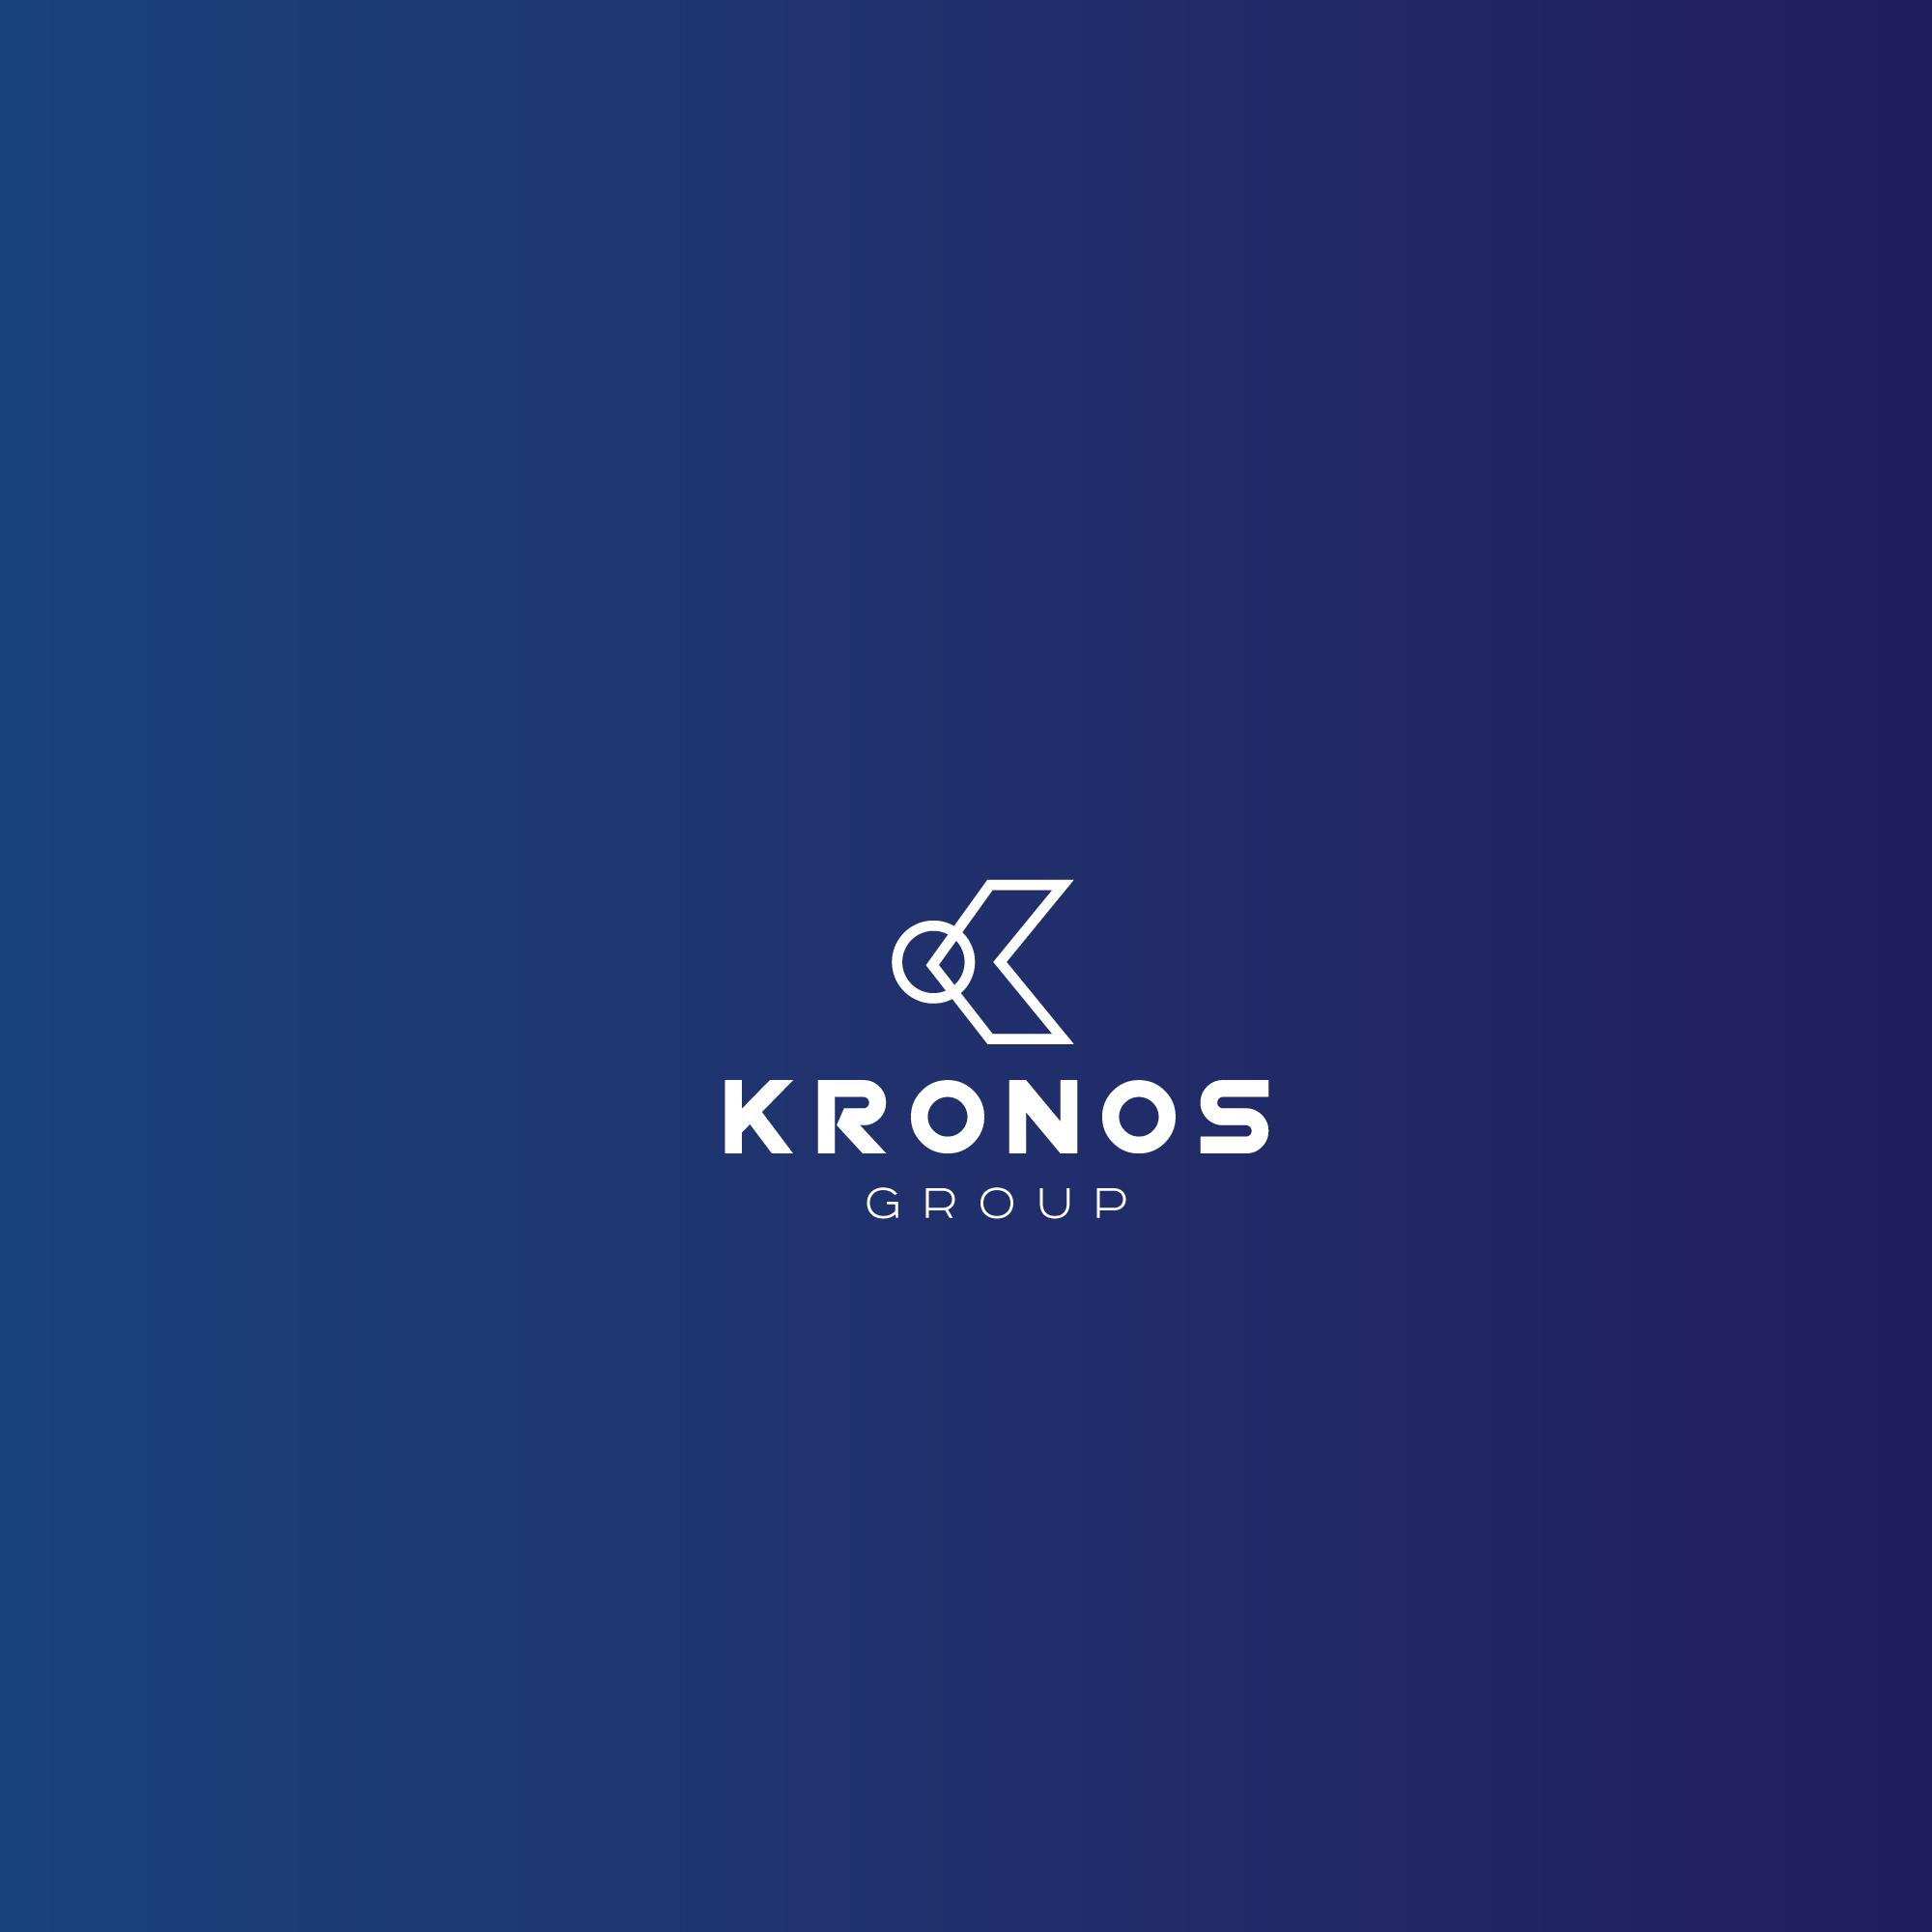 Разработать логотип KRONOS фото f_3765faf0f83cec1b.jpg